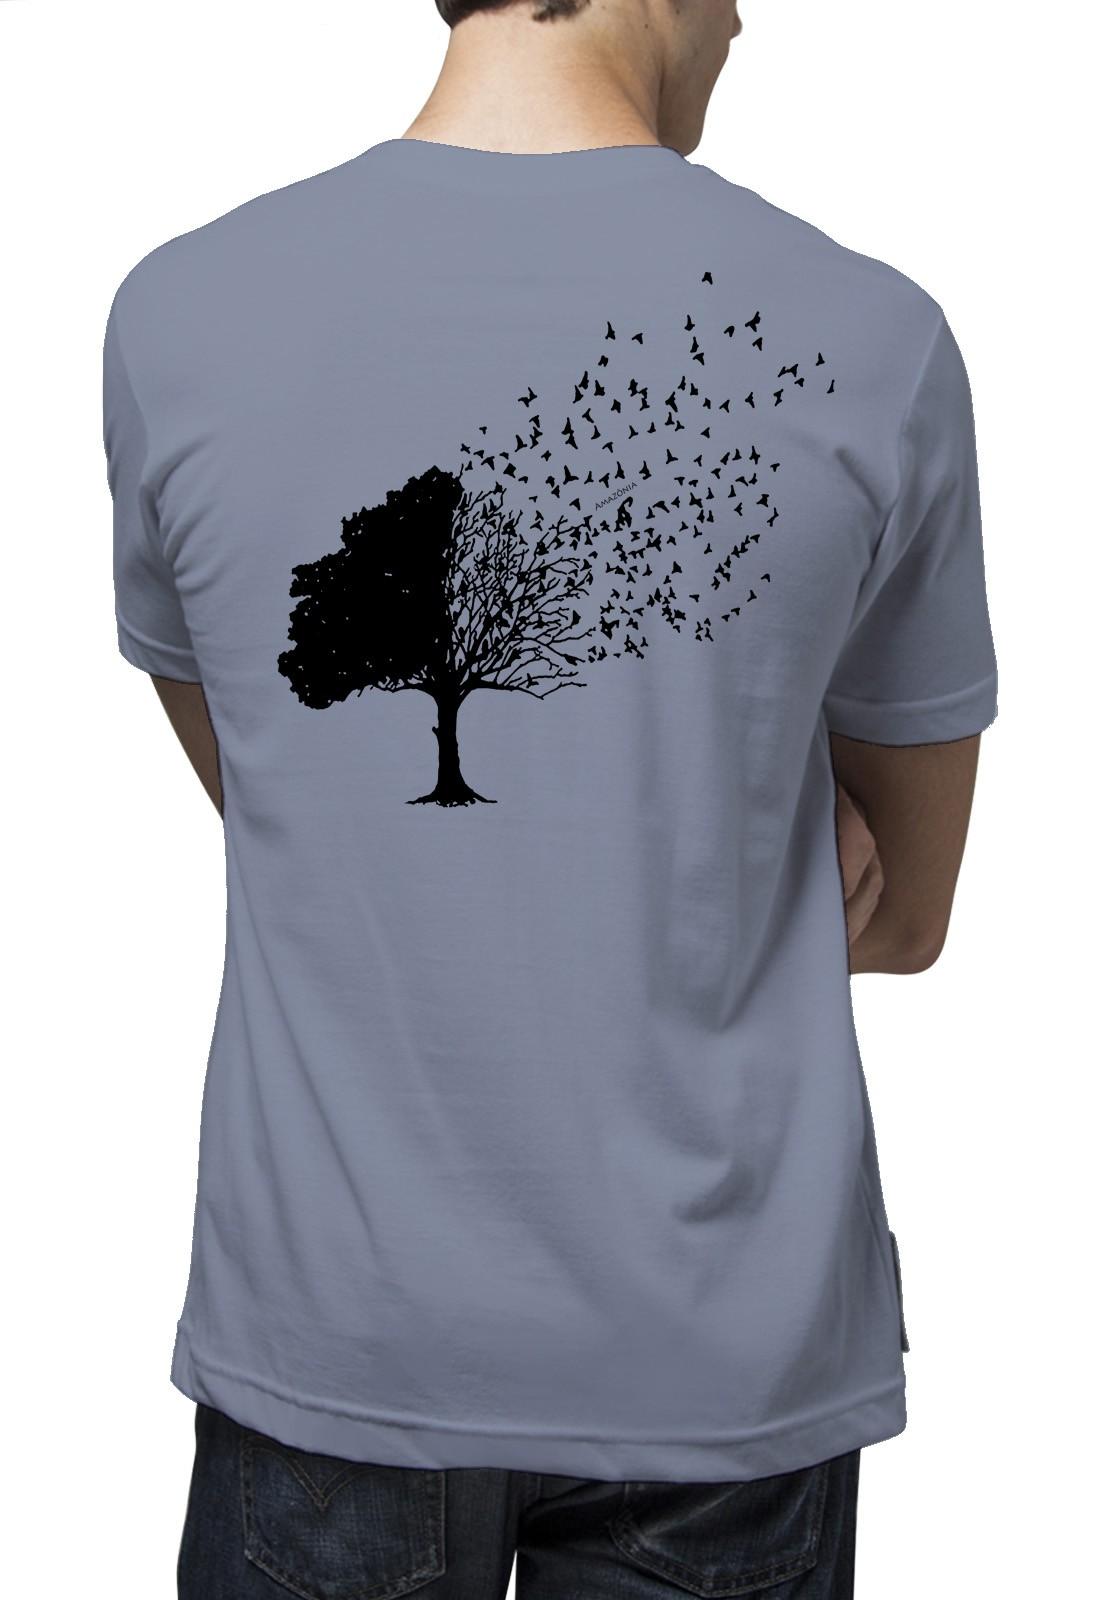 Camiseta Amazônia Árvore Pássaros - Azul